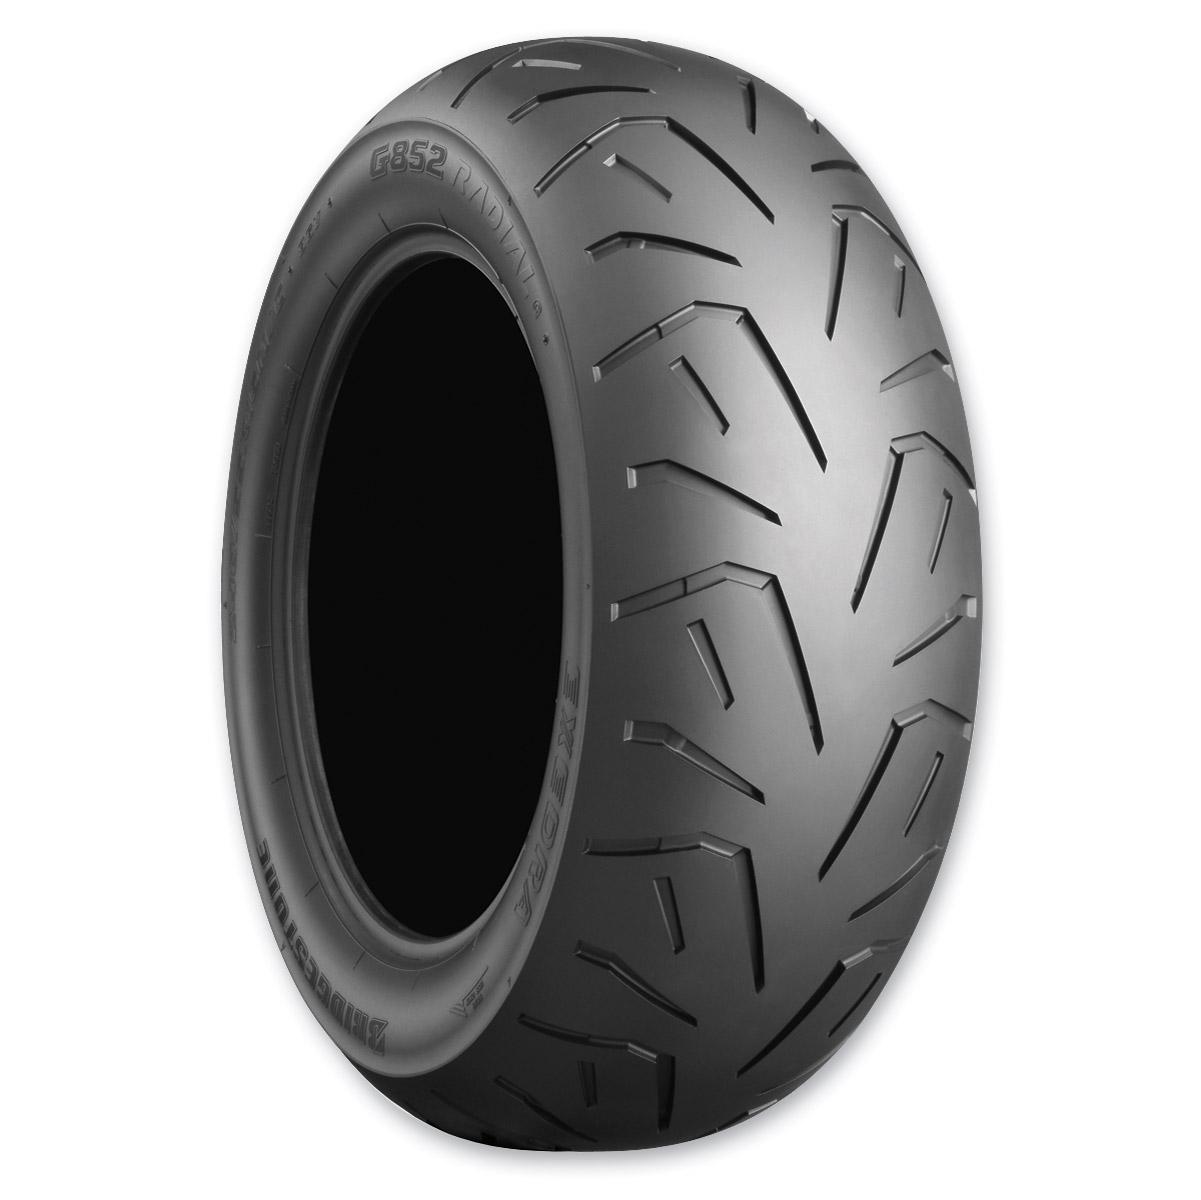 bridgestone exedra g852 240 55r16 rear tire zz26297 j p cycles rh jpcycles com Manuals in PDF User Manual Template